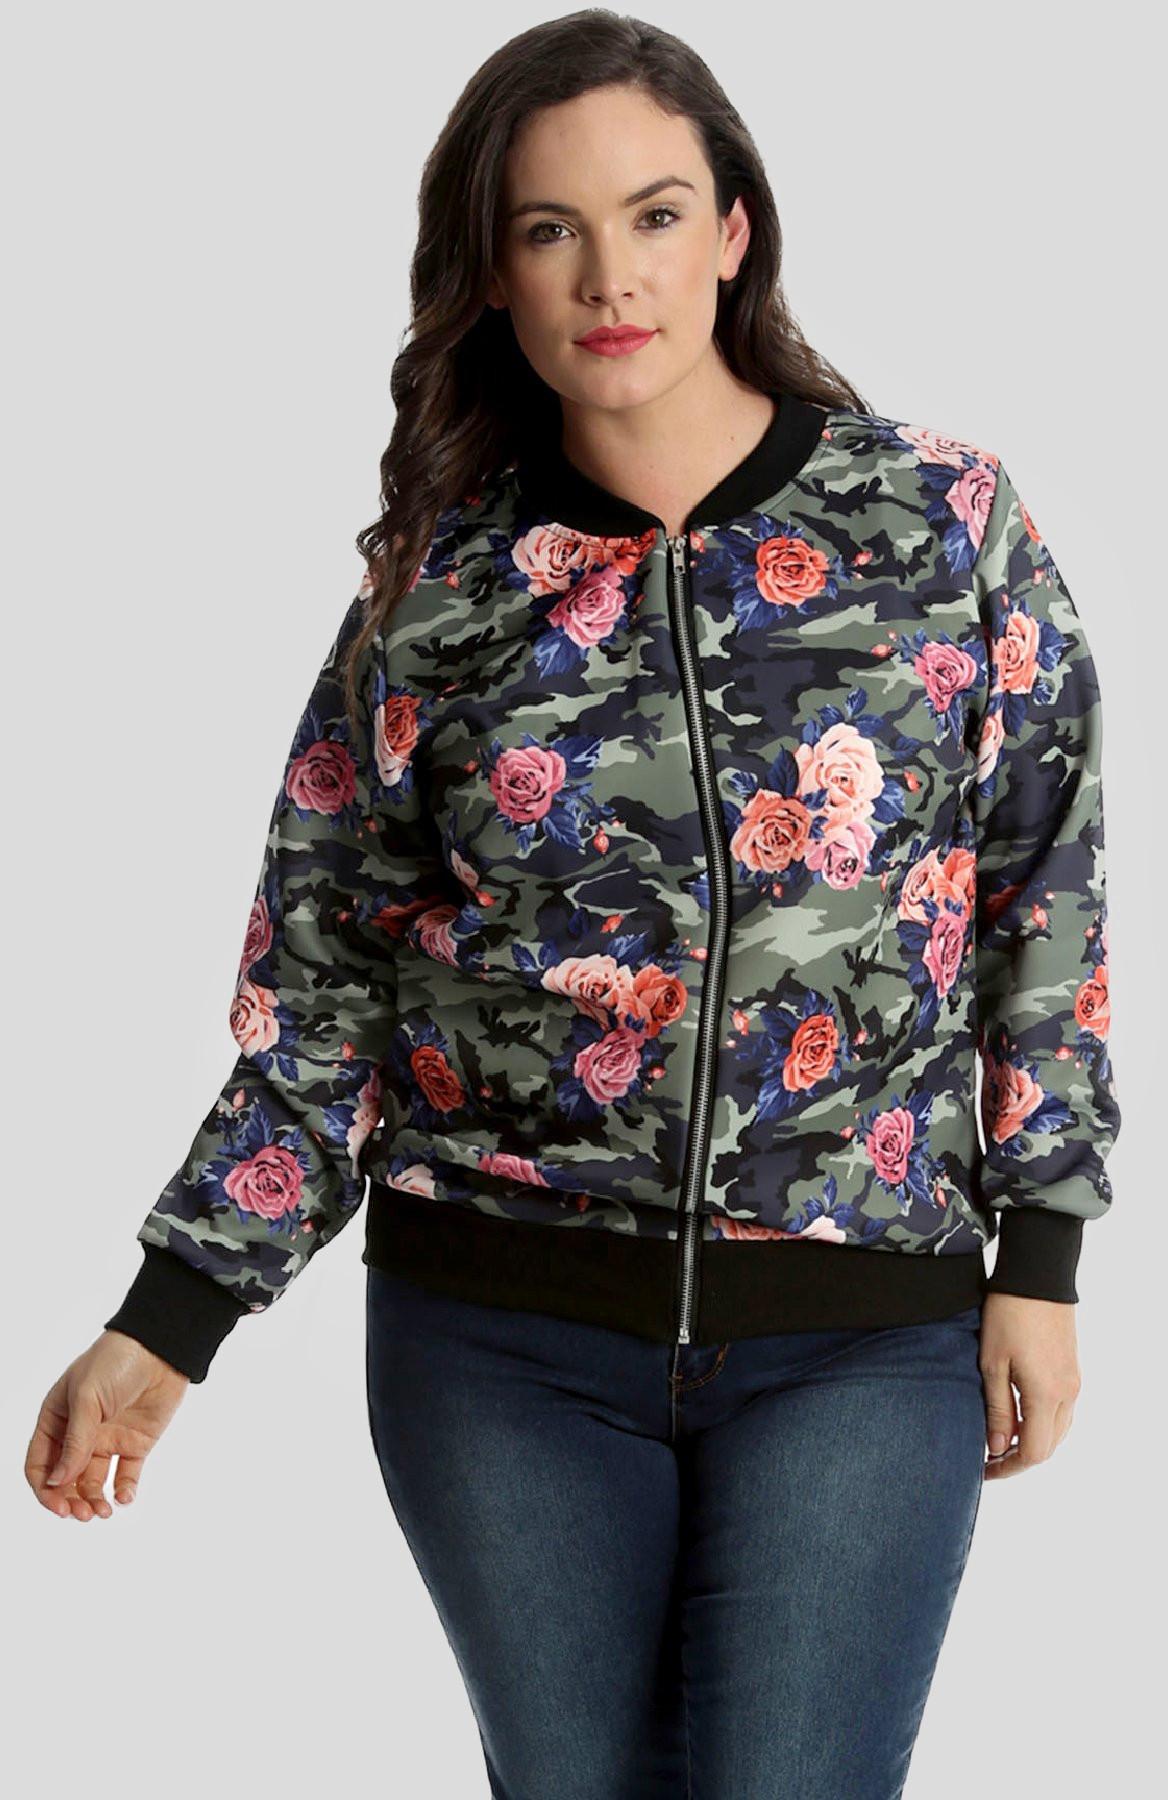 Paisley Zip Up Bomber Jacket Coat Ribbed Top Plus 14-28 Ladies Women/'s Floral